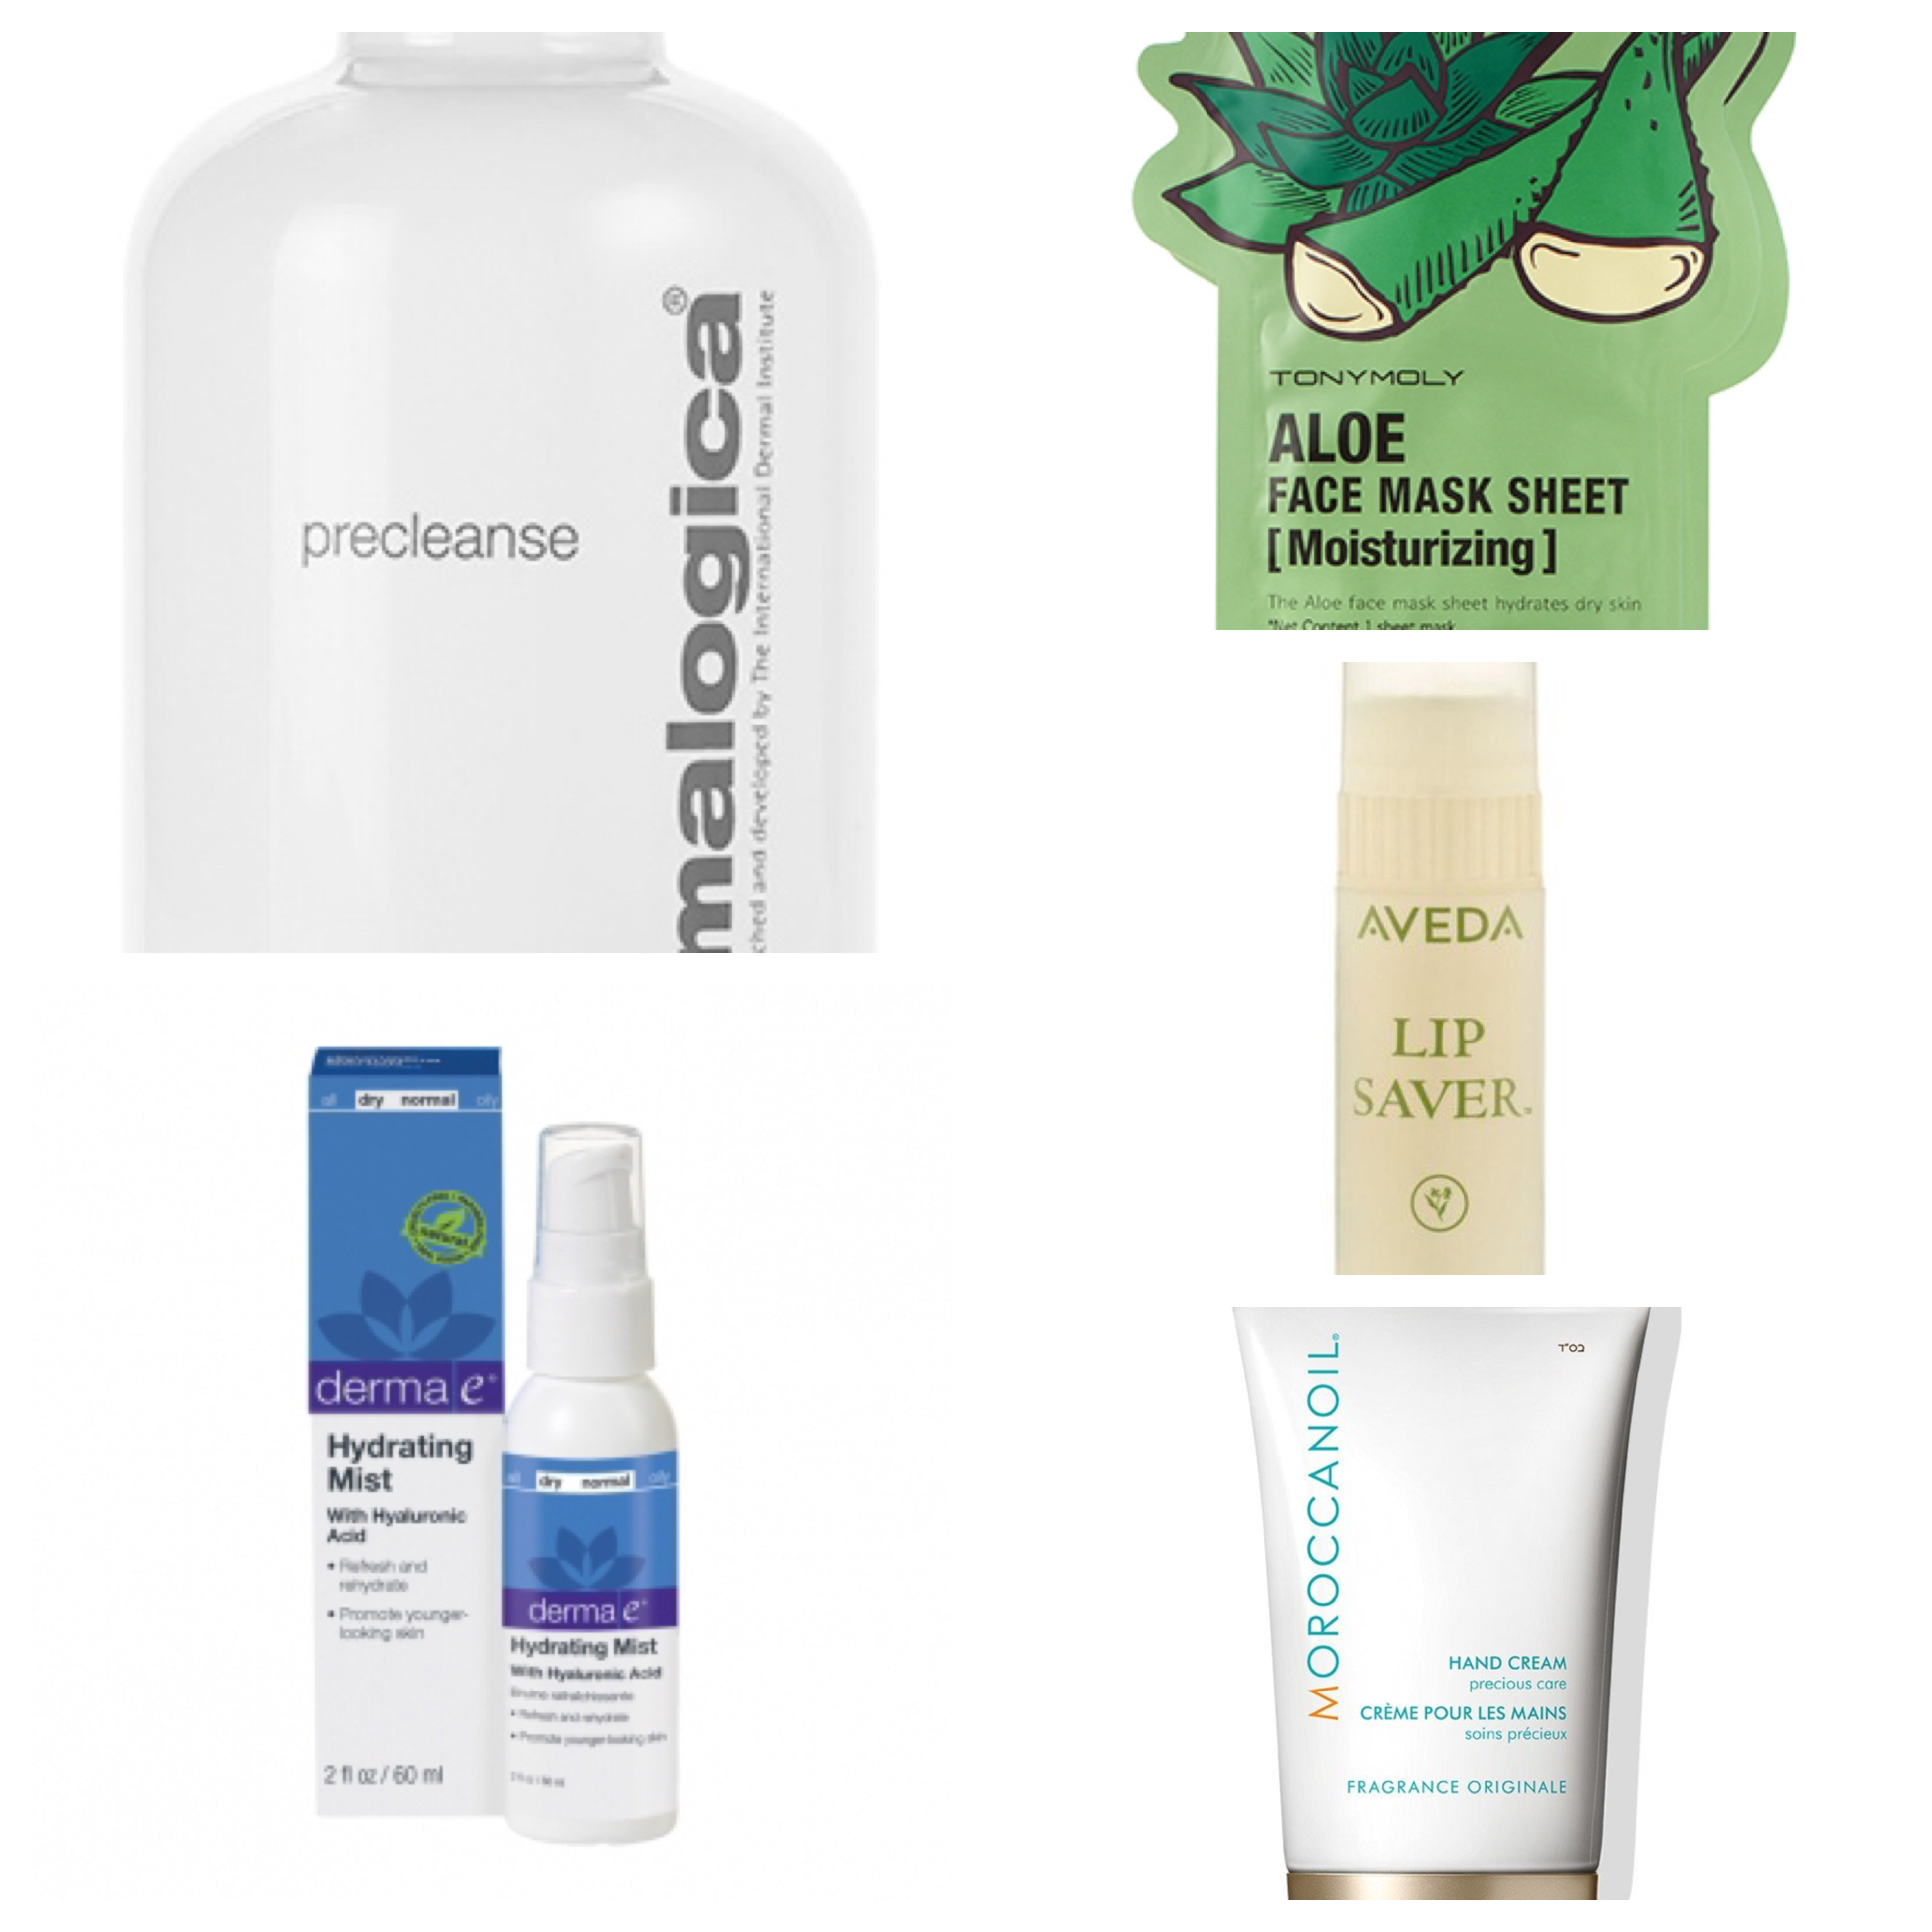 My Top 5 Skin-Saving Tips